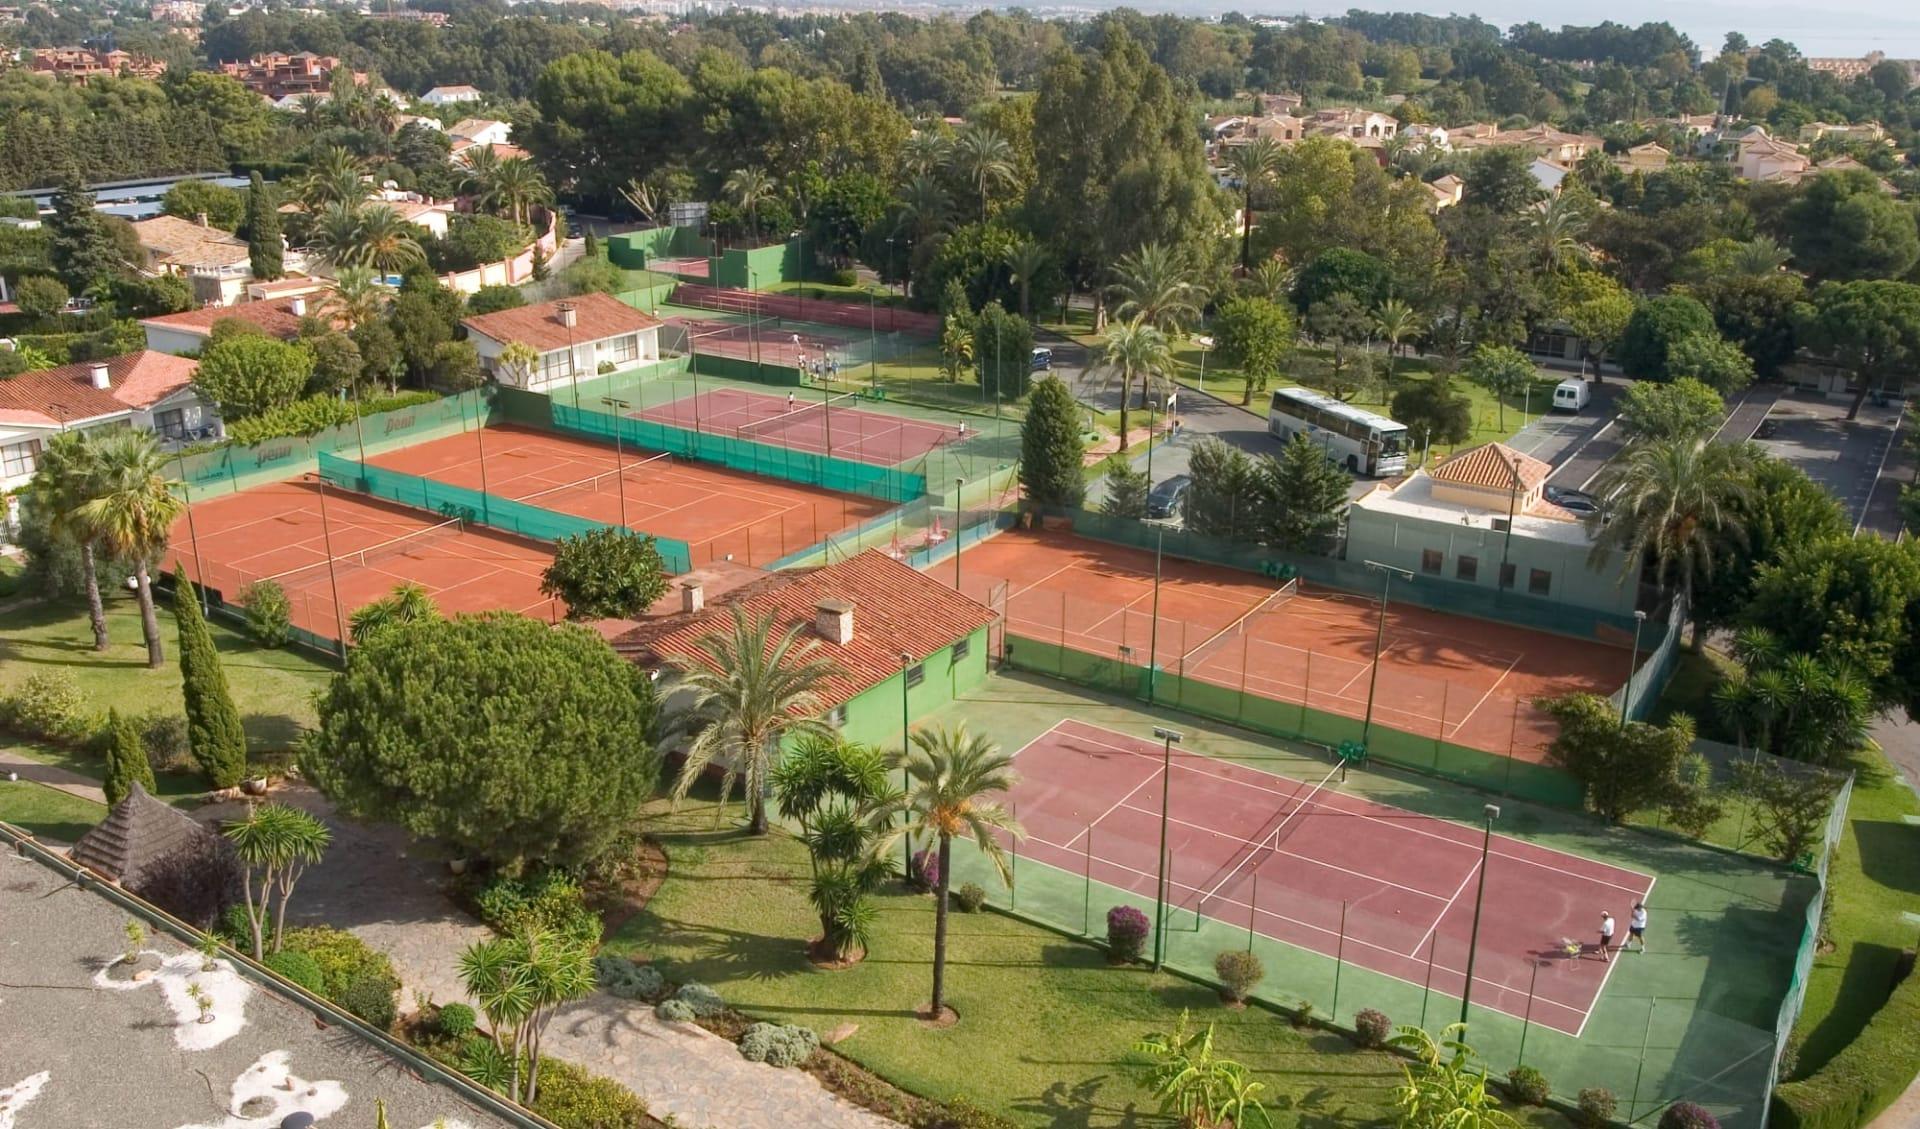 09.10. - 16.10.2021 Padel-Tennis Herbstferien ab Malaga: Atalaya - Tennisplätze